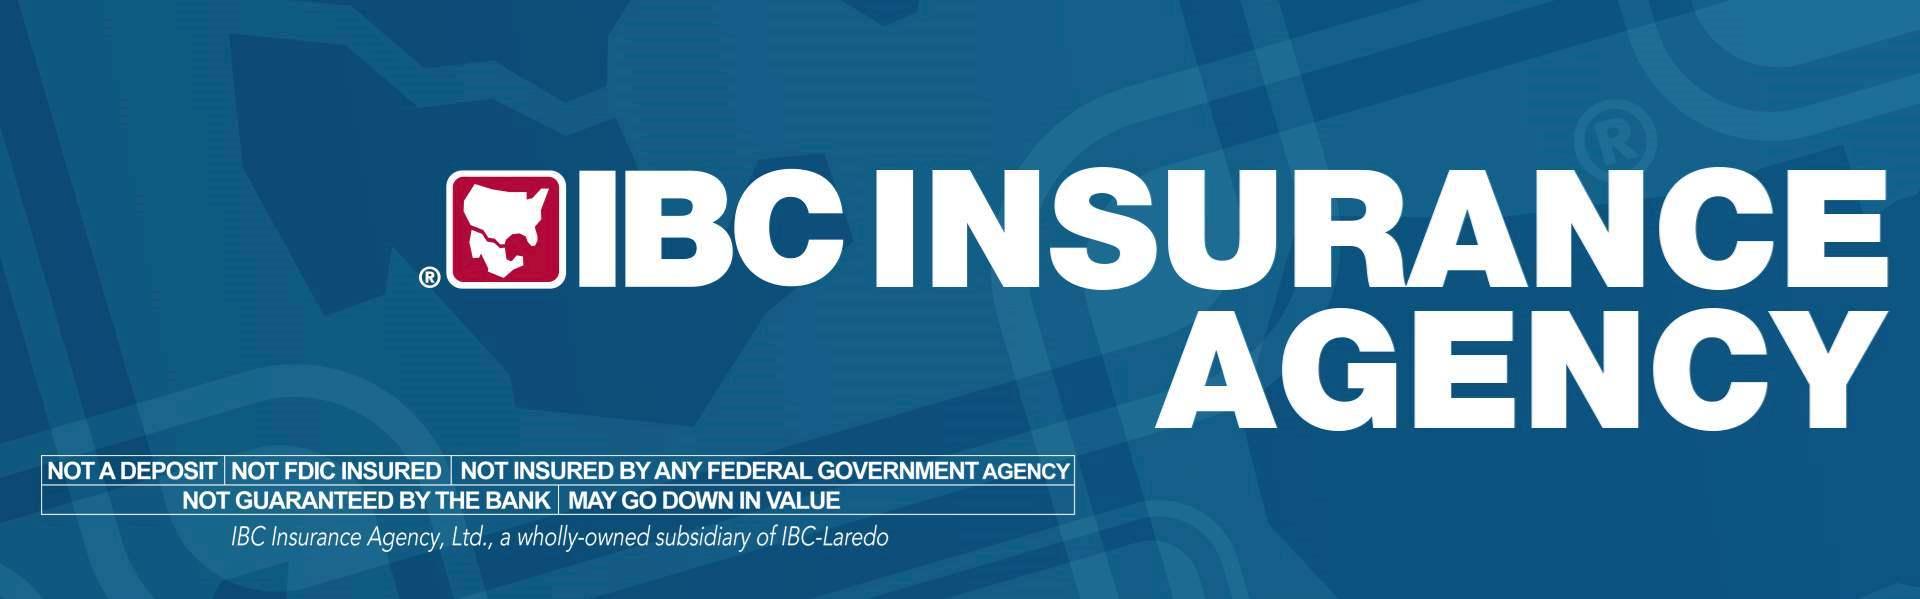 IBC Bank Personal Insurance